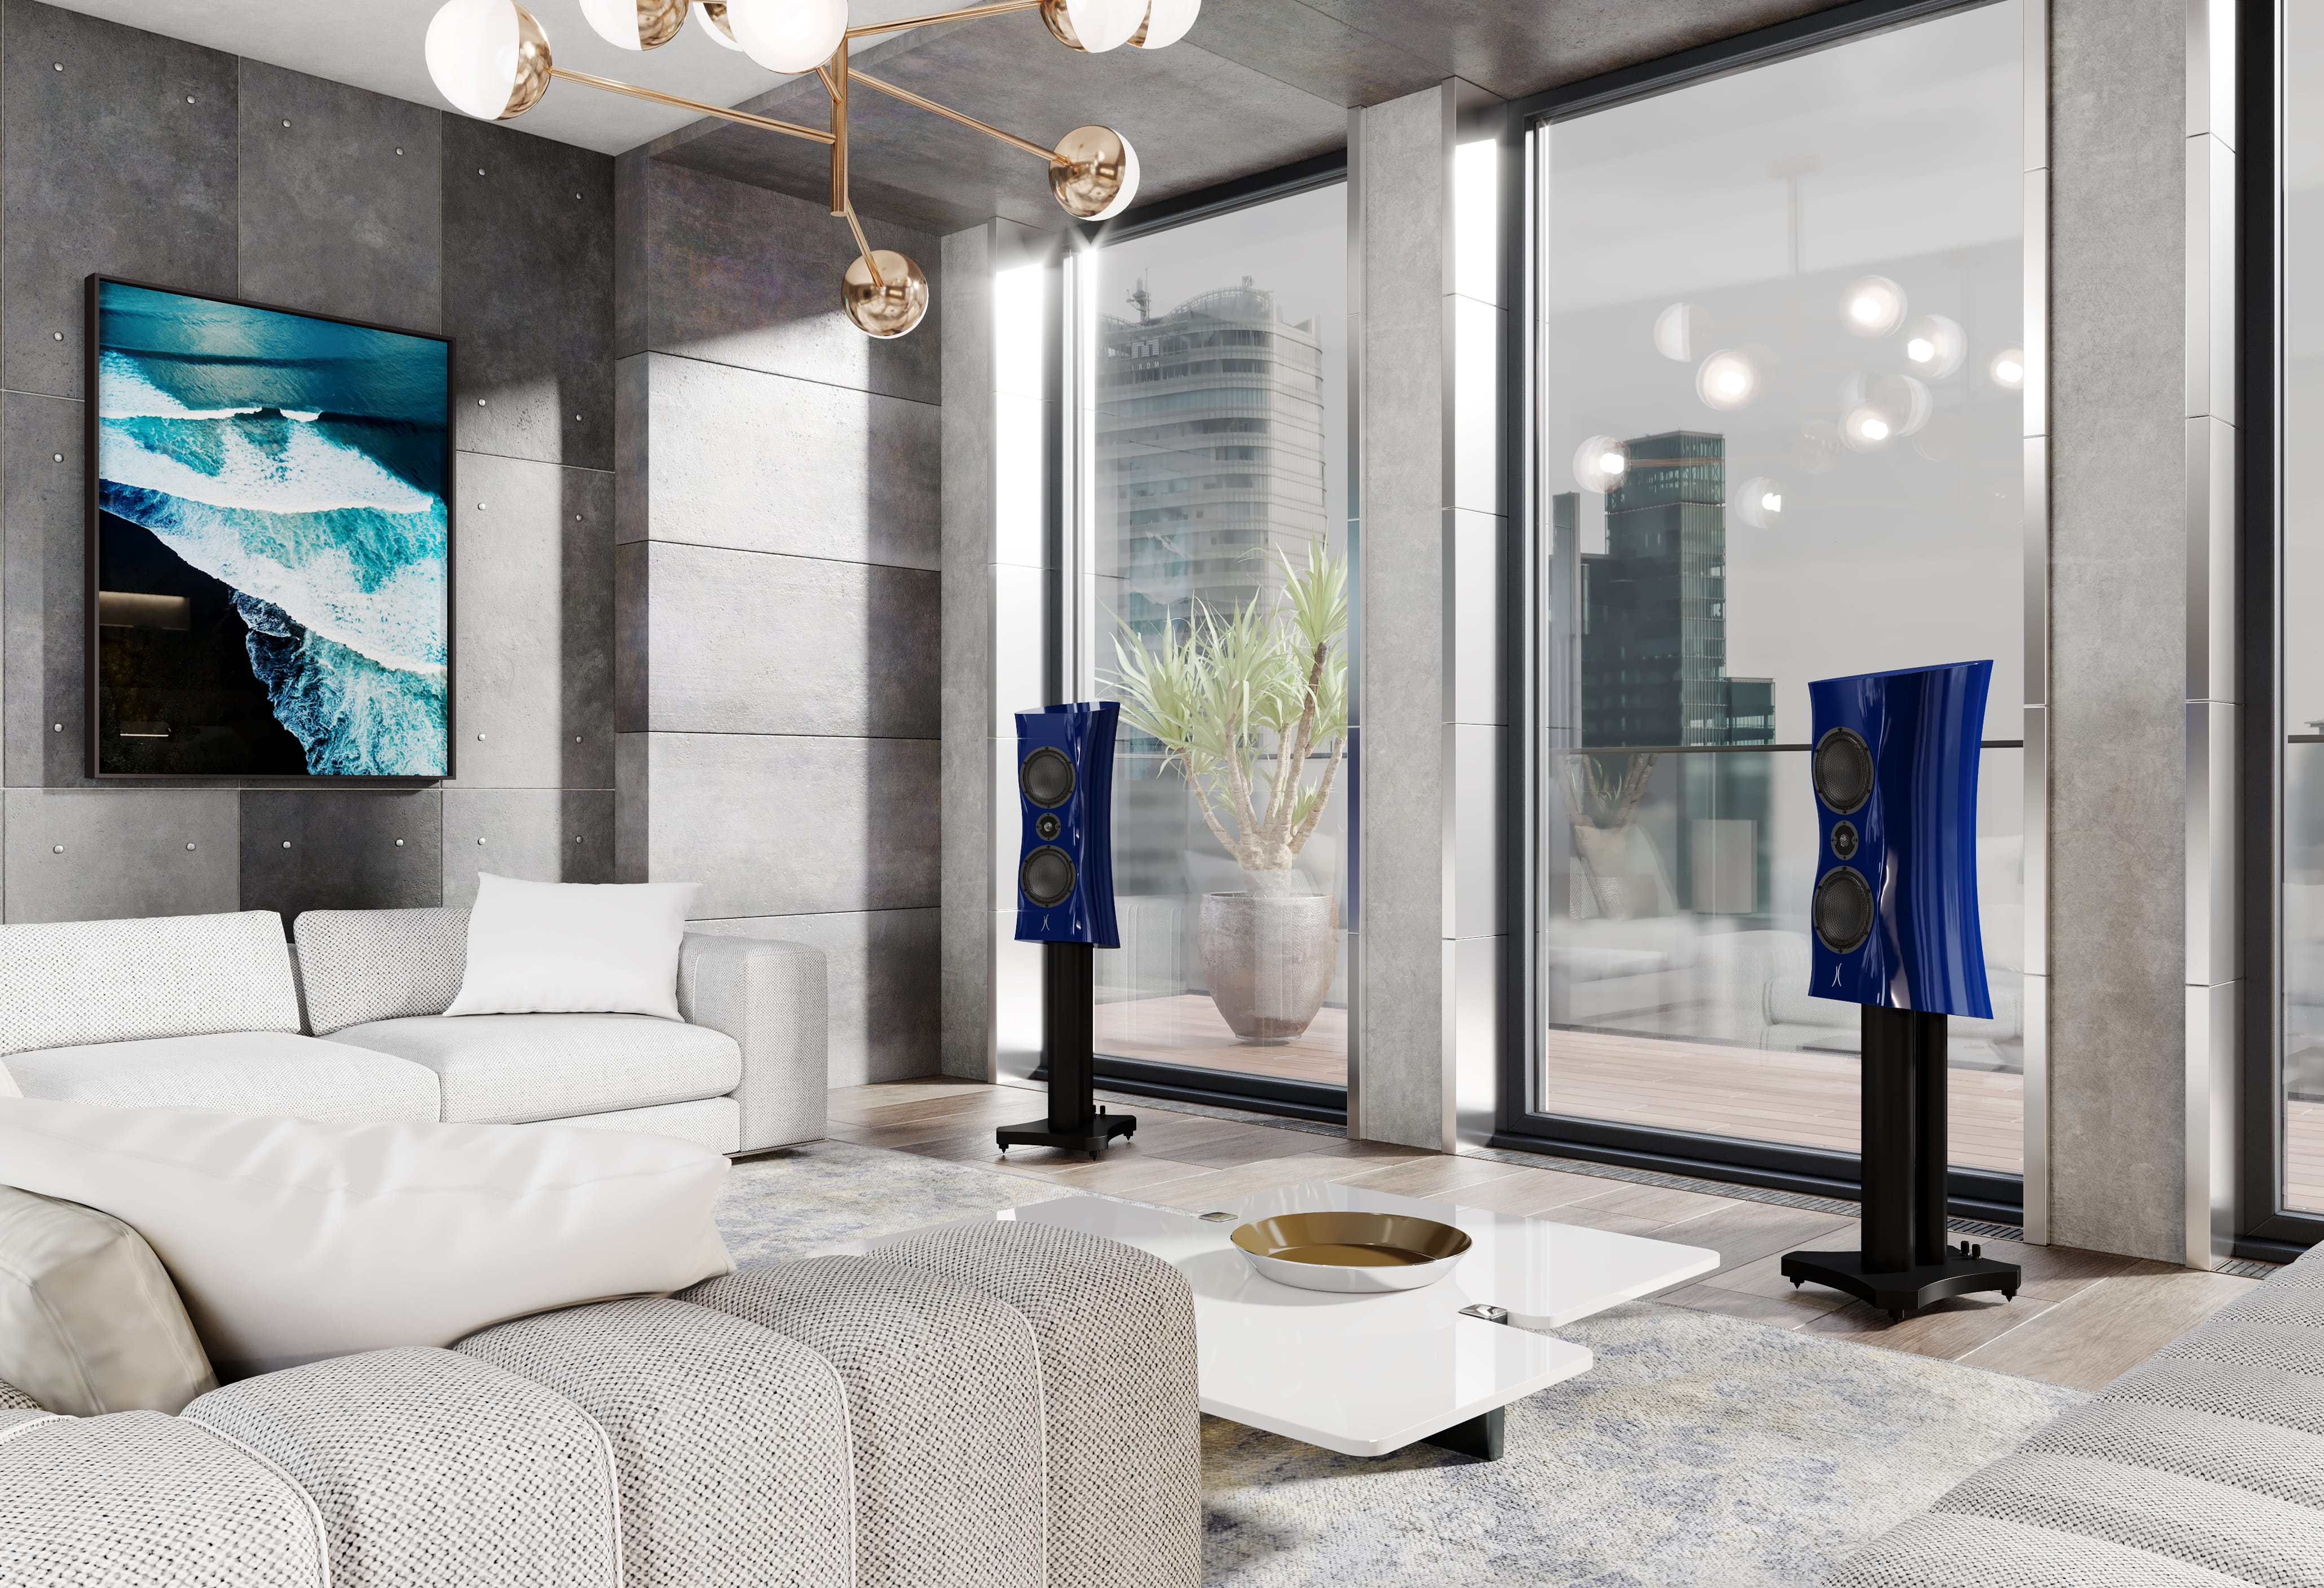 Estelon decorates interiors with high-end audio